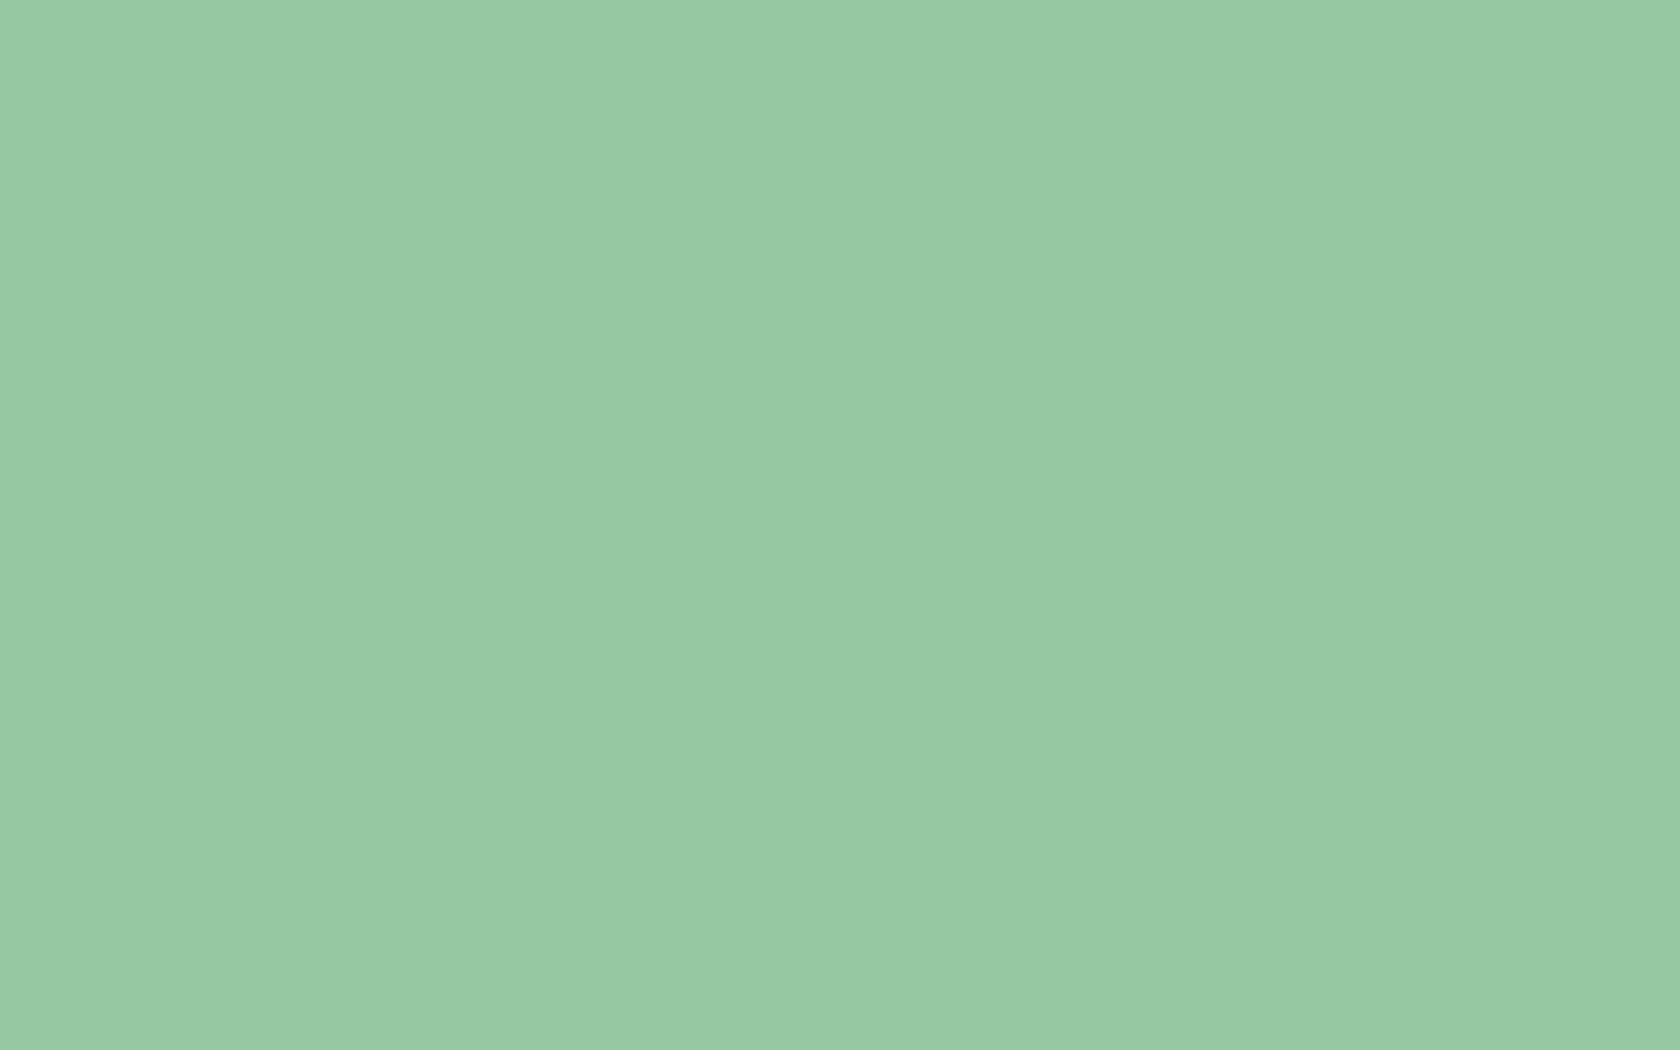 1680x1050 Eton Blue Solid Color Background